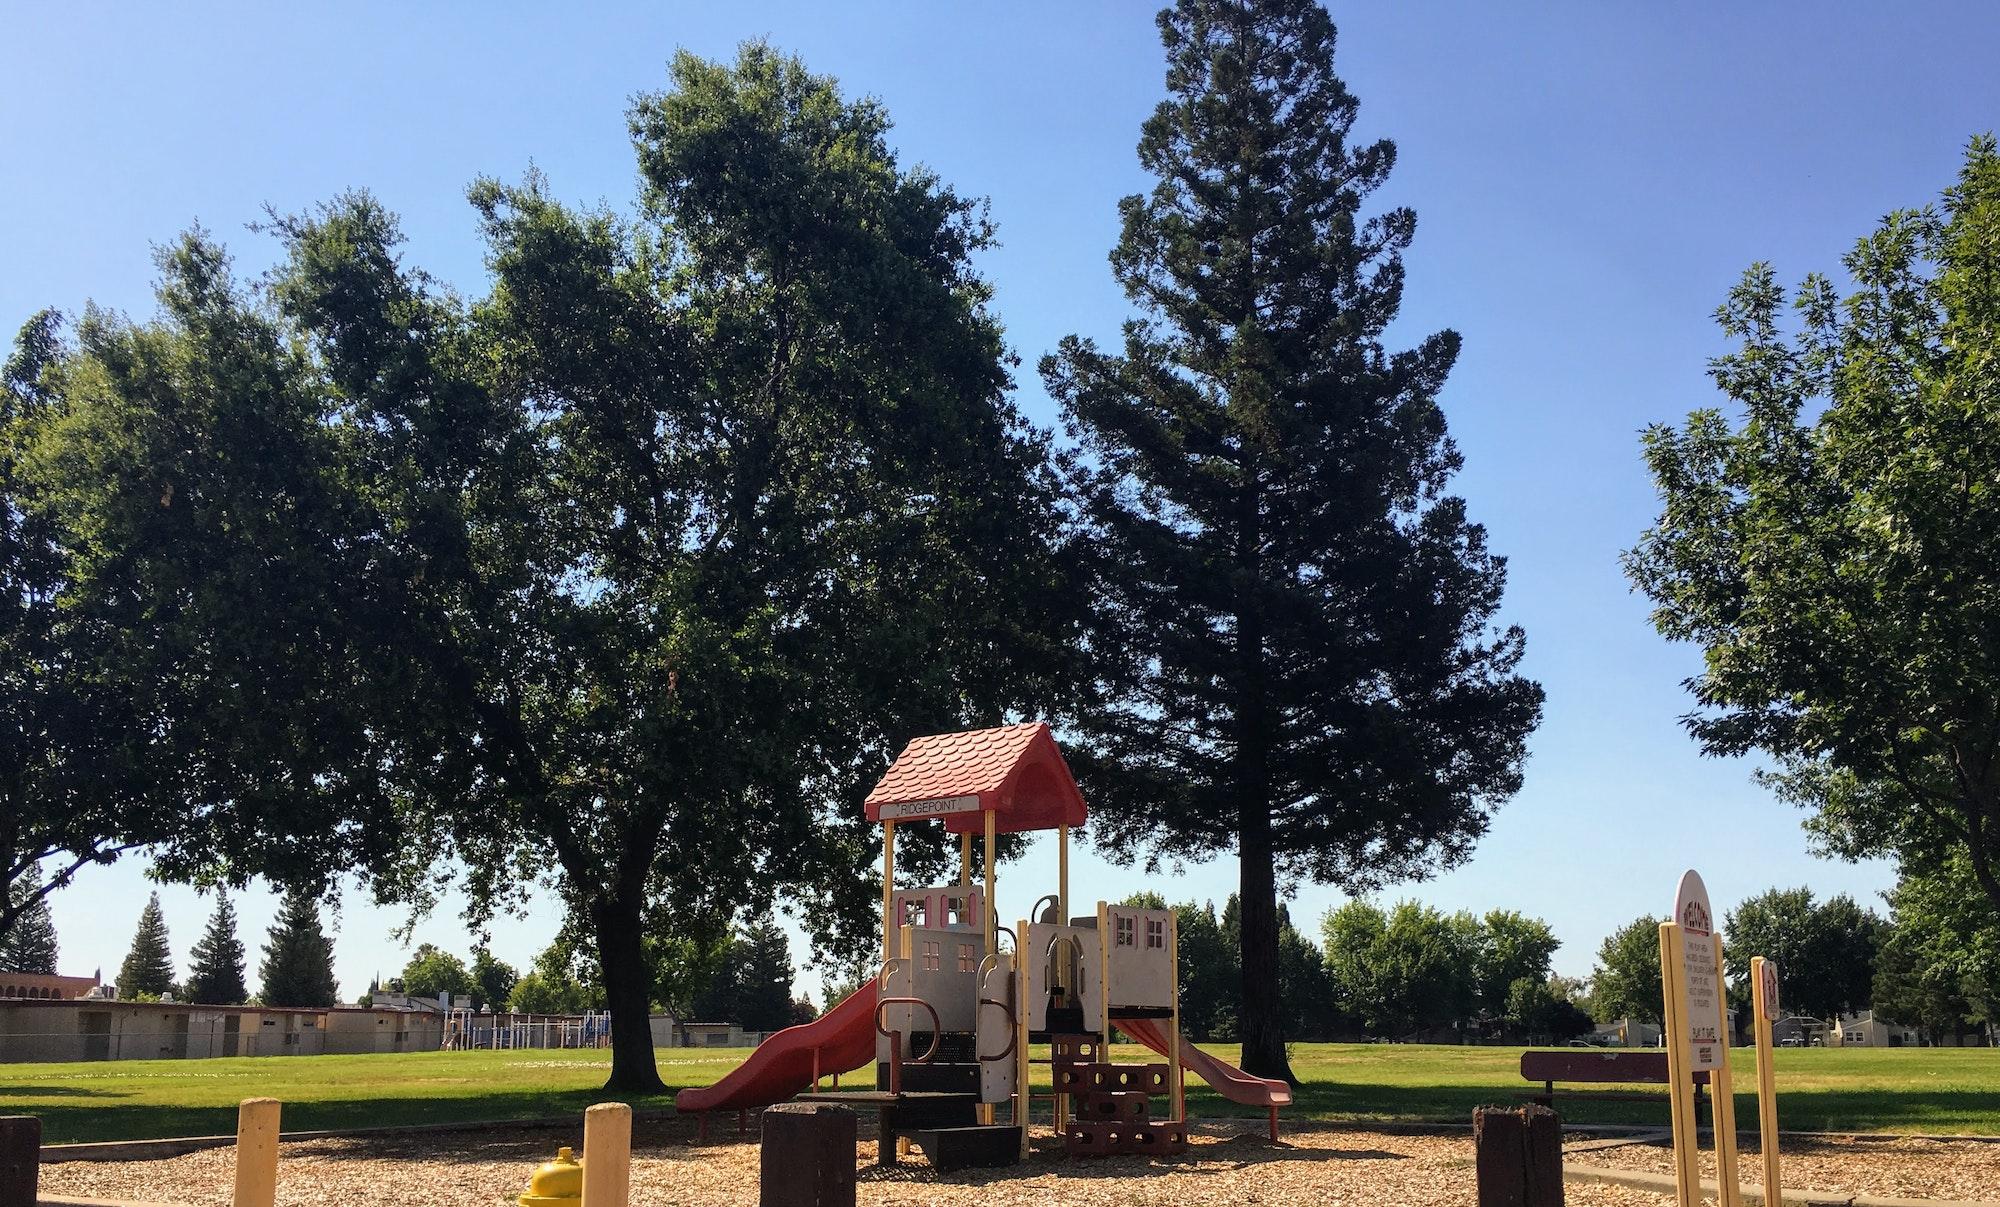 Ridgepoint Park playground